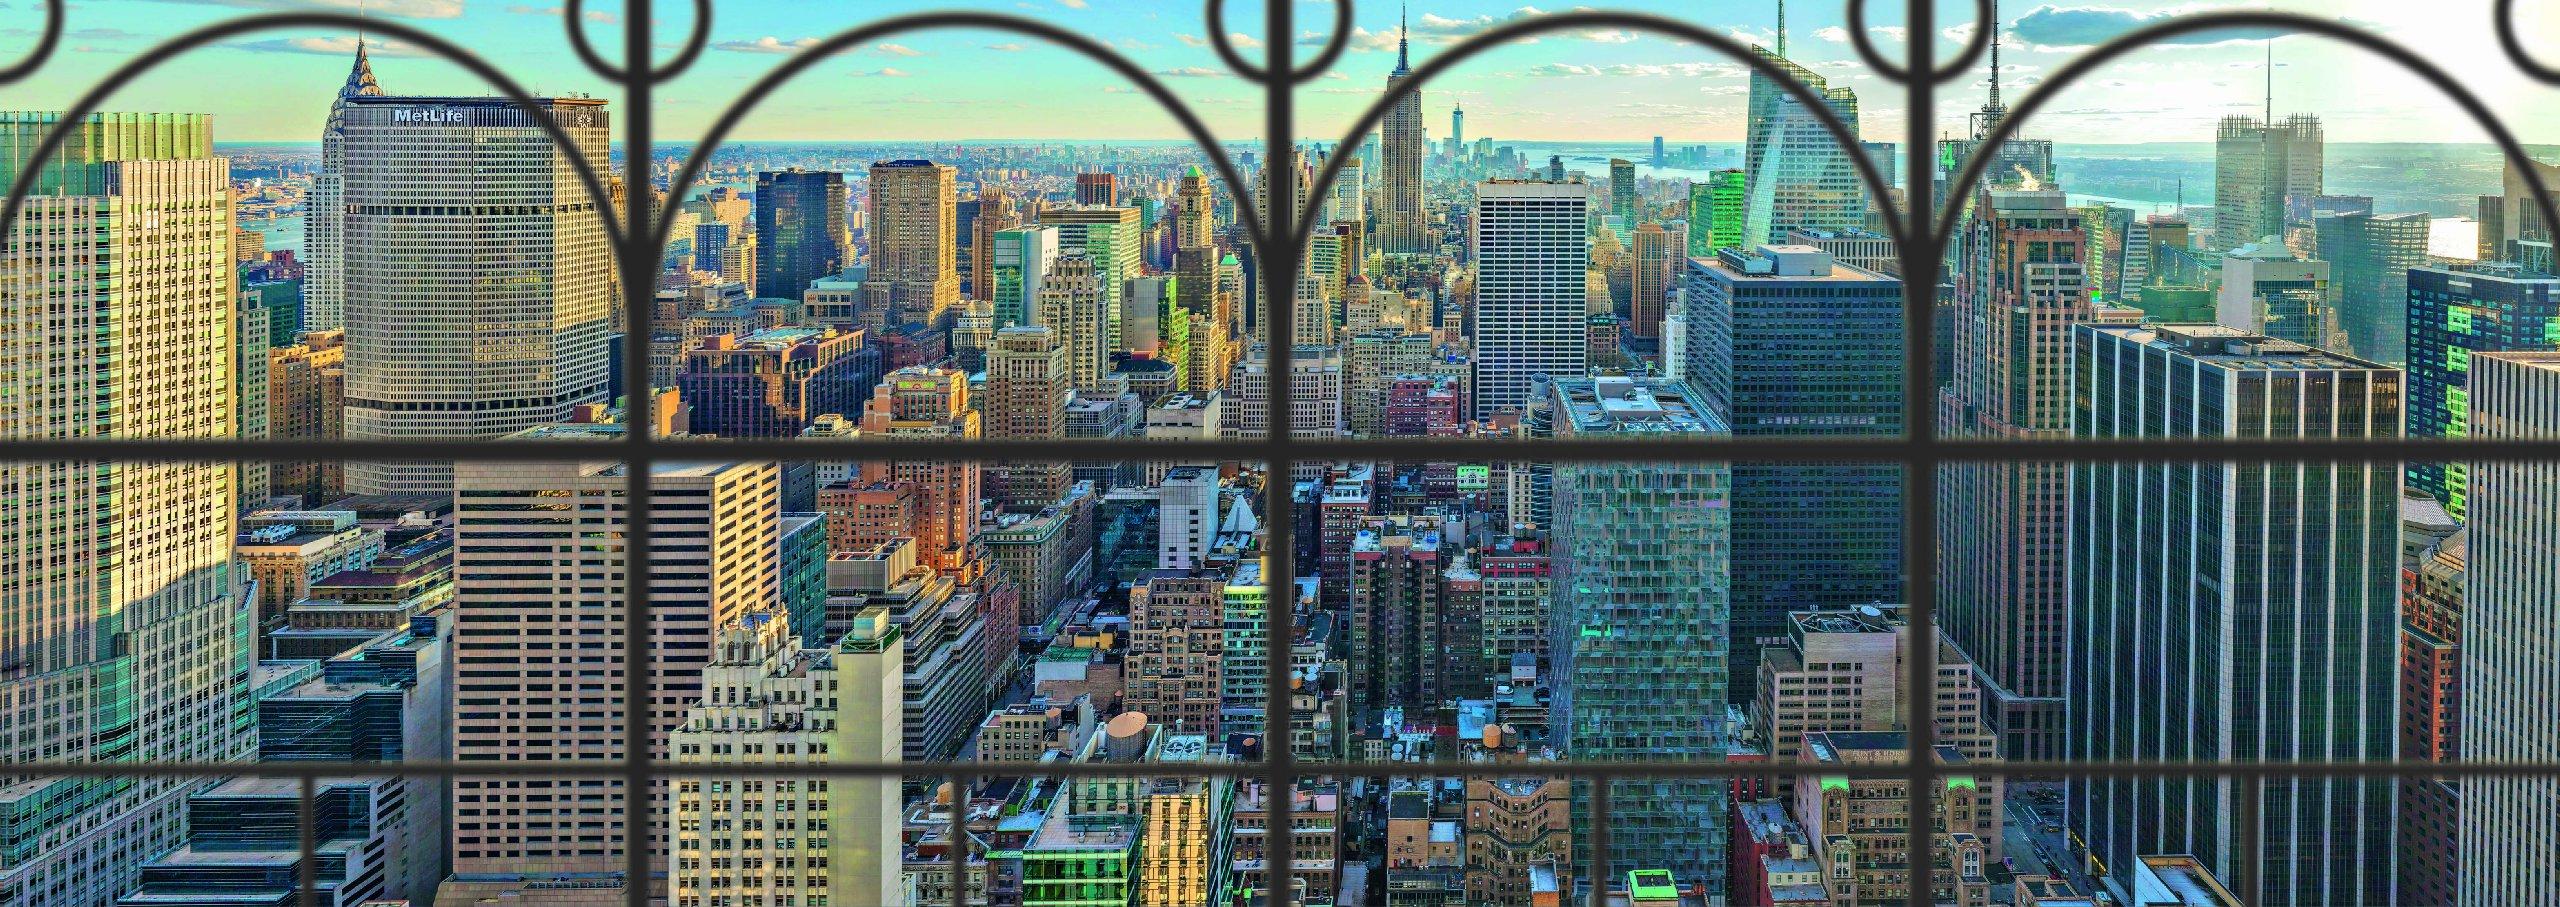 Ravensburger New York City Jigsaw Puzzle (32000-Piece) by Ravensburger (Image #2)